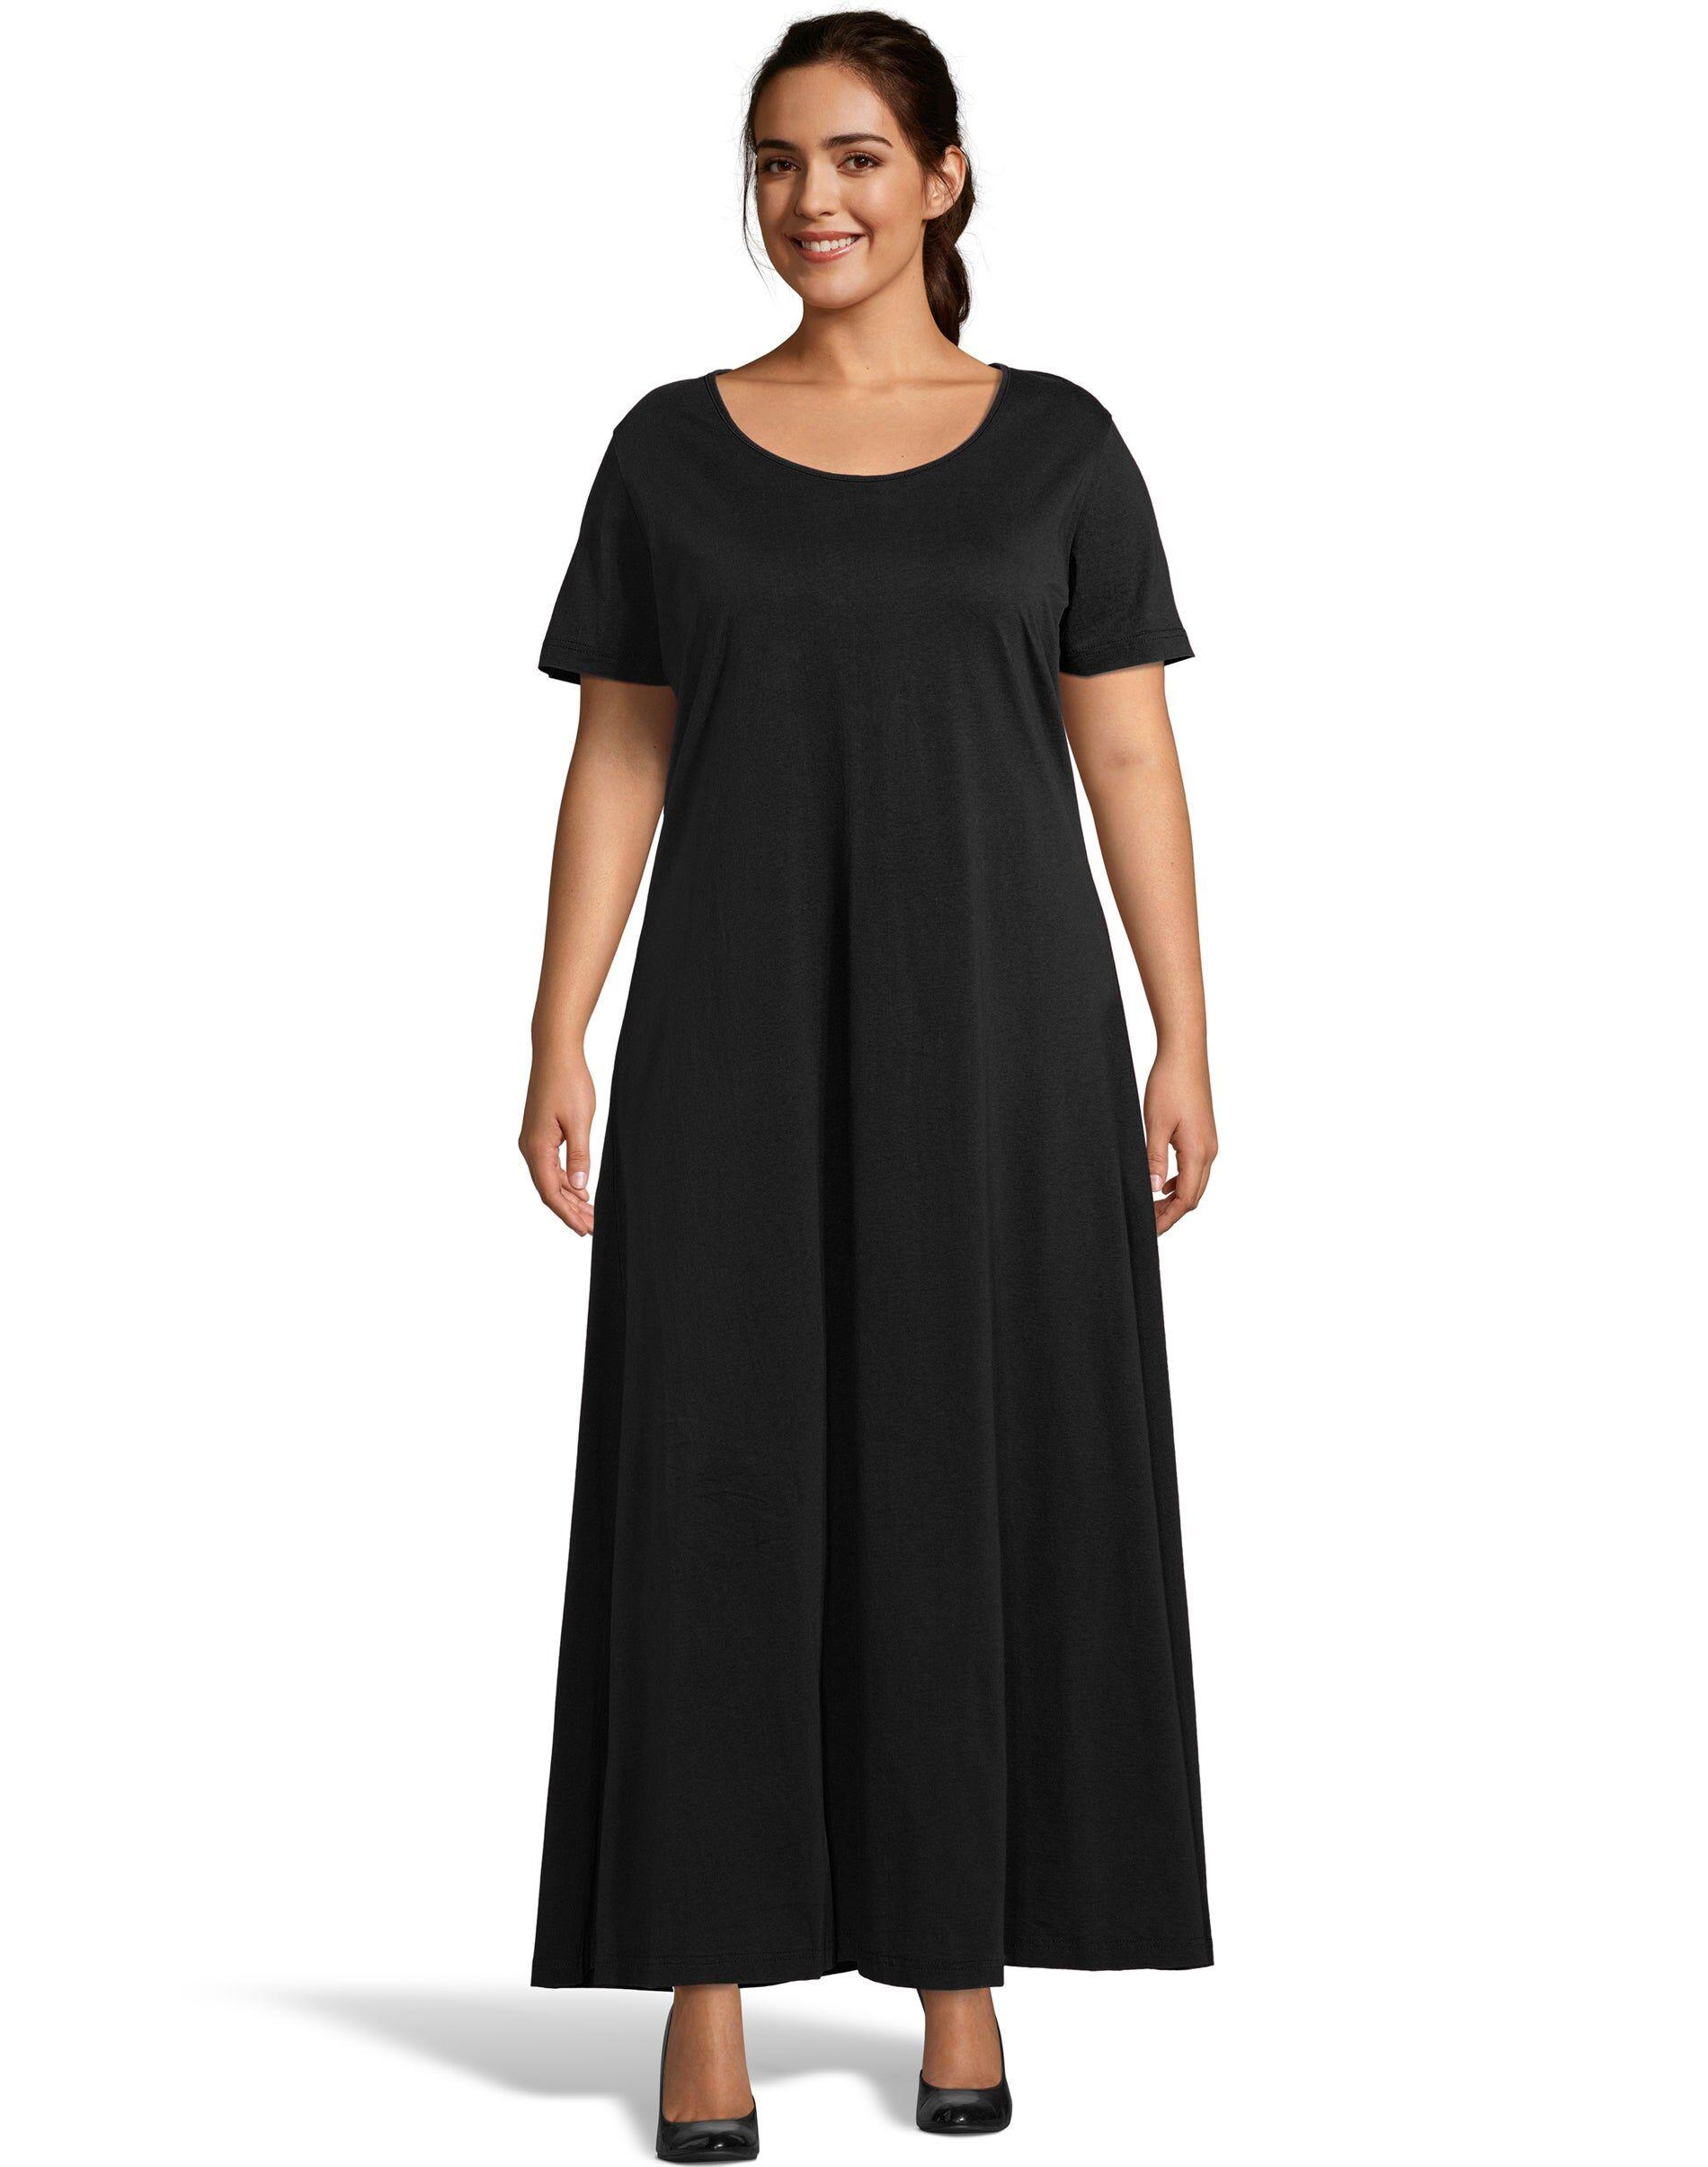 Just My Size Jersey Matchables Maxi Dress Black 5X Women's